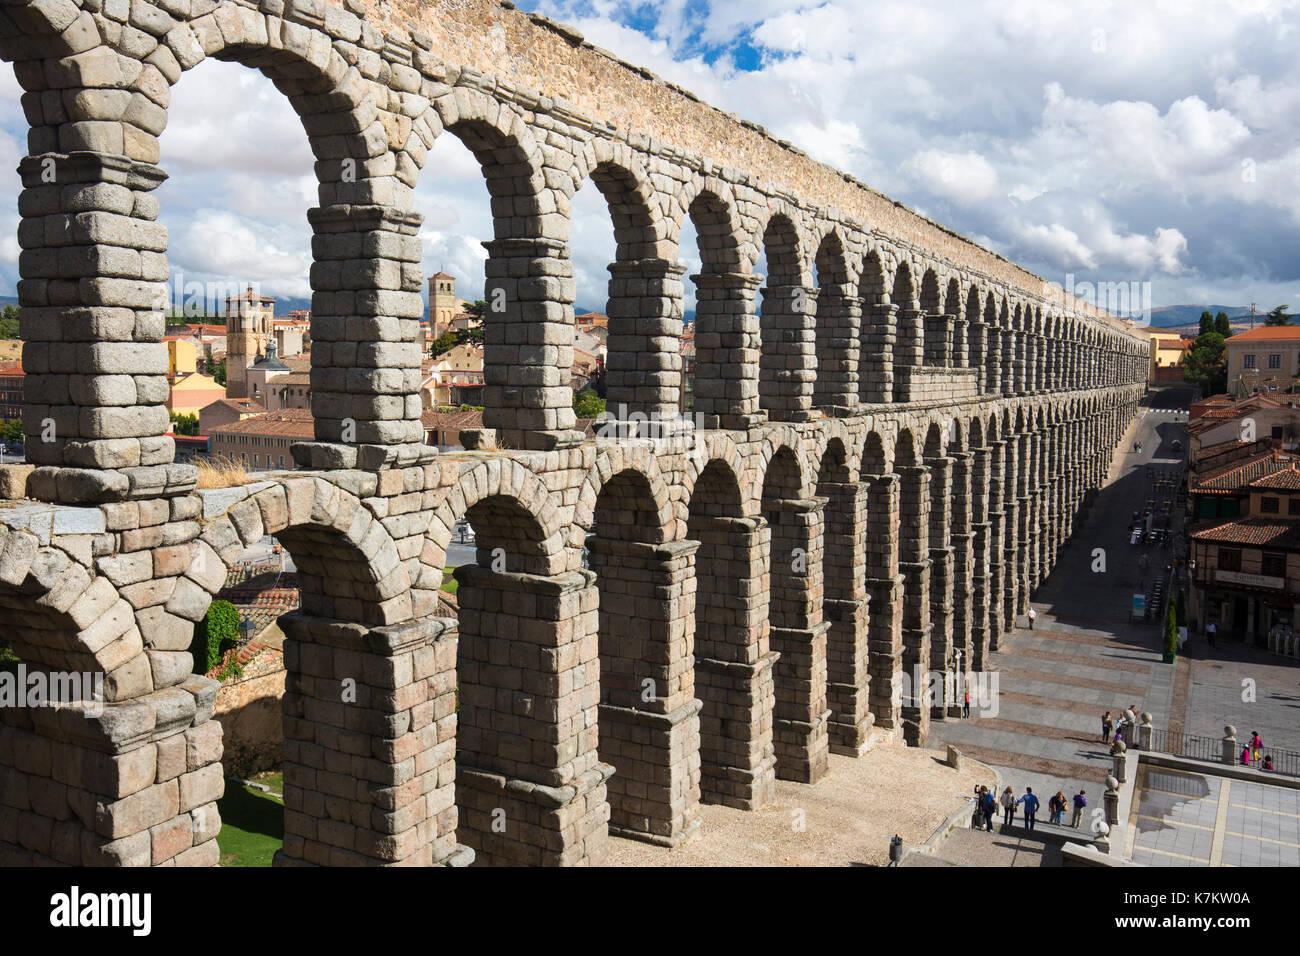 Famous spectacular Roman aqueduct, built of granite blocks, and Plaza del Azoguejo, Segovia, Spain - Stock Image